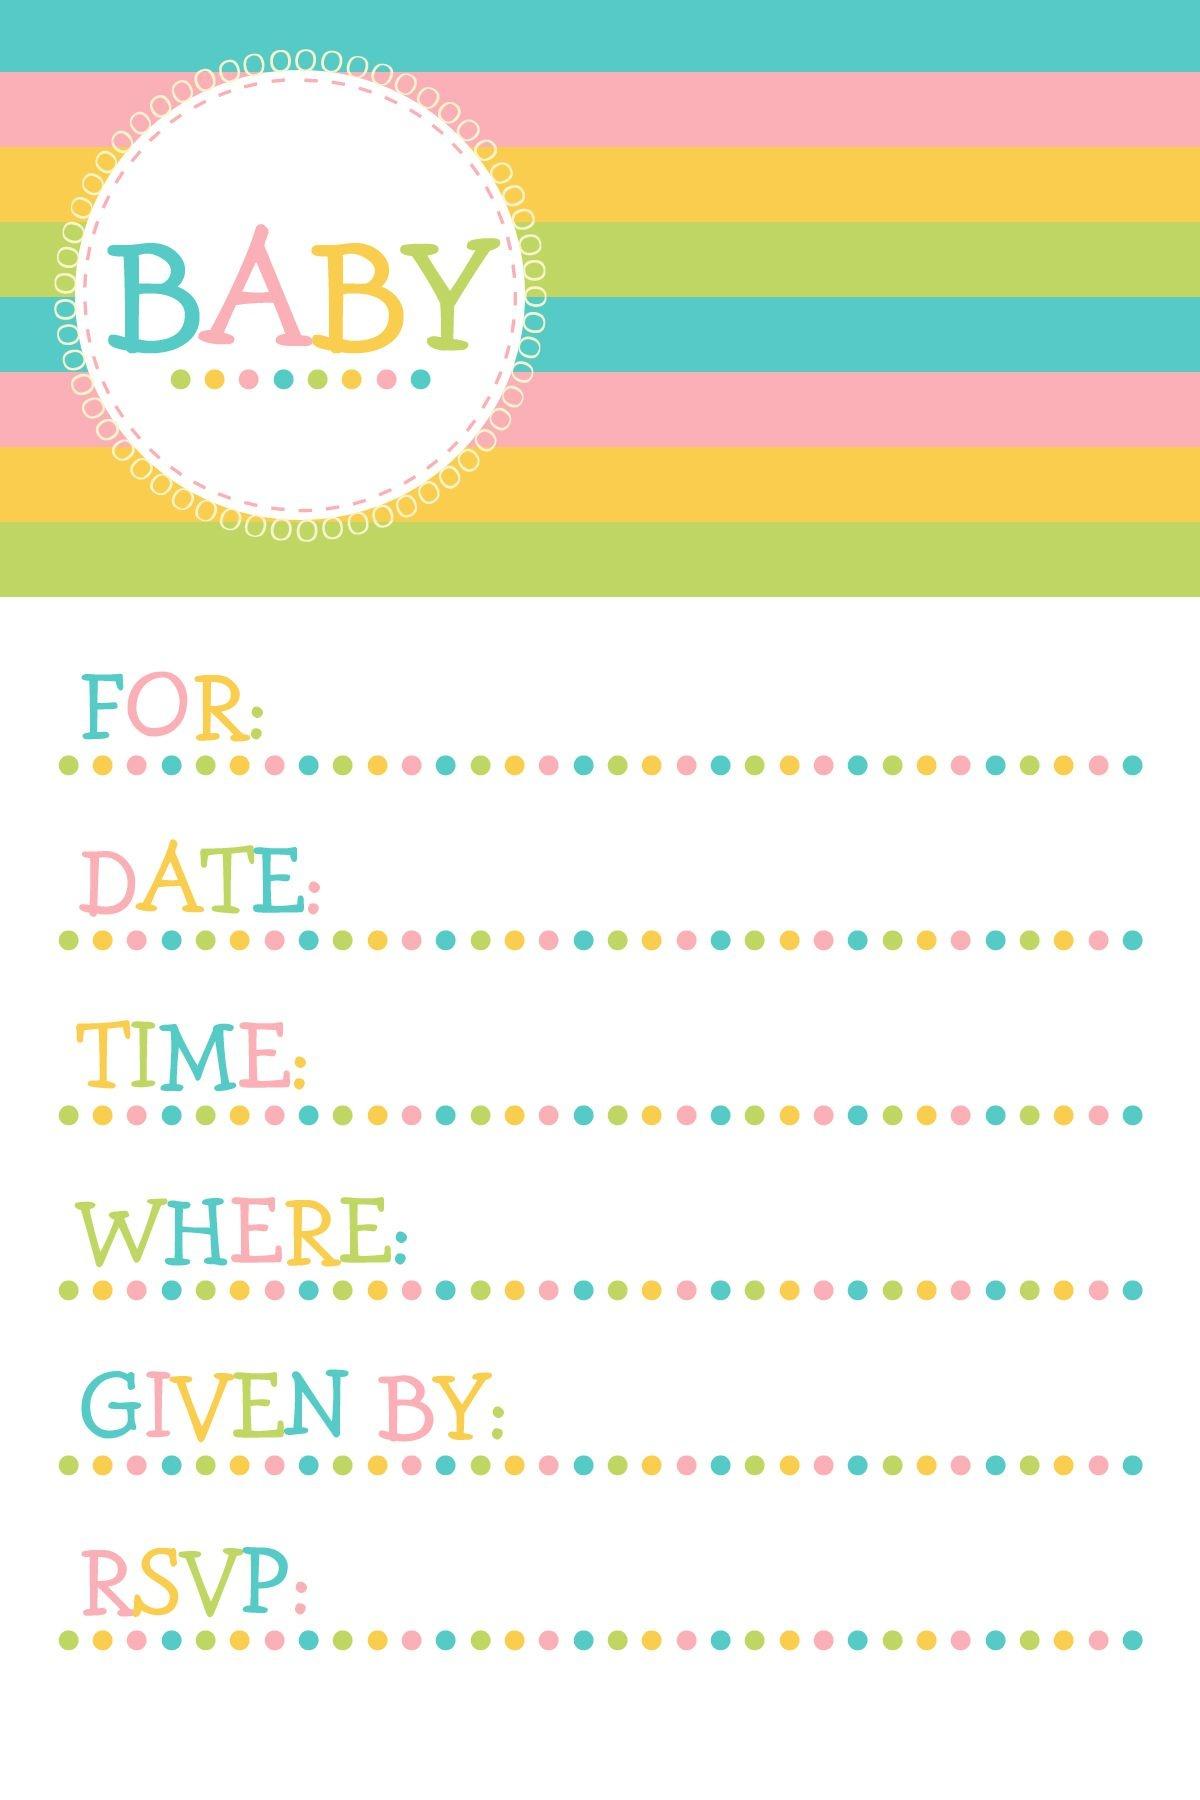 25 Adorable Free Printable Baby Shower Invitations - Free Baby Shower Invitation Maker Online Printable